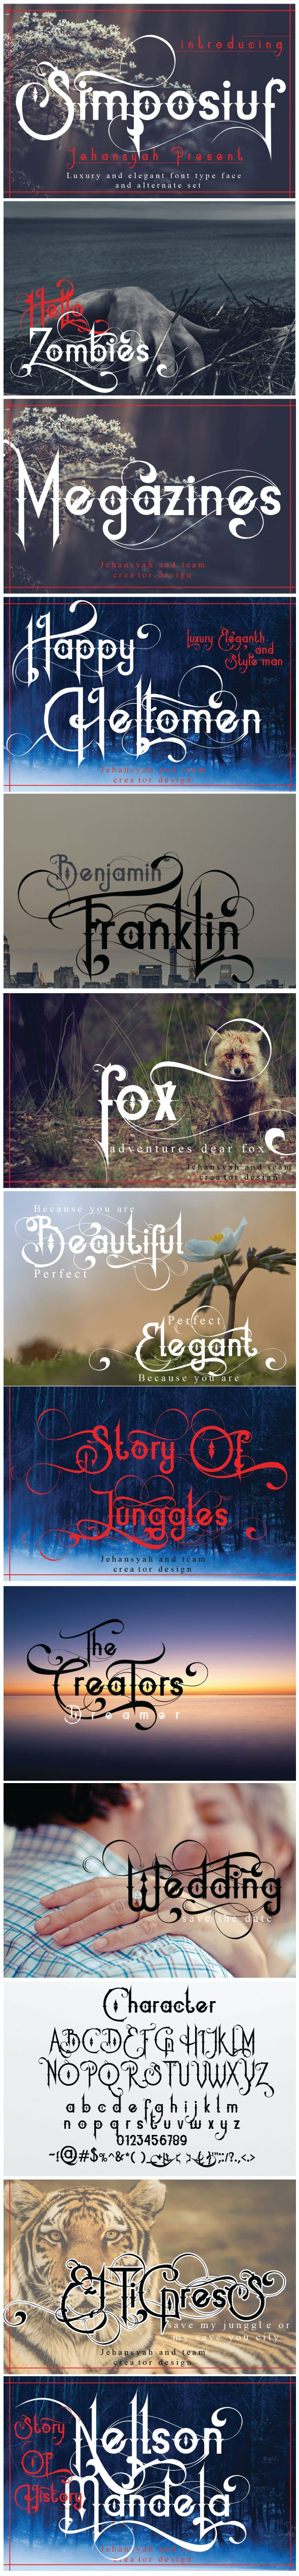 Simposiuf - Decorative Fonts